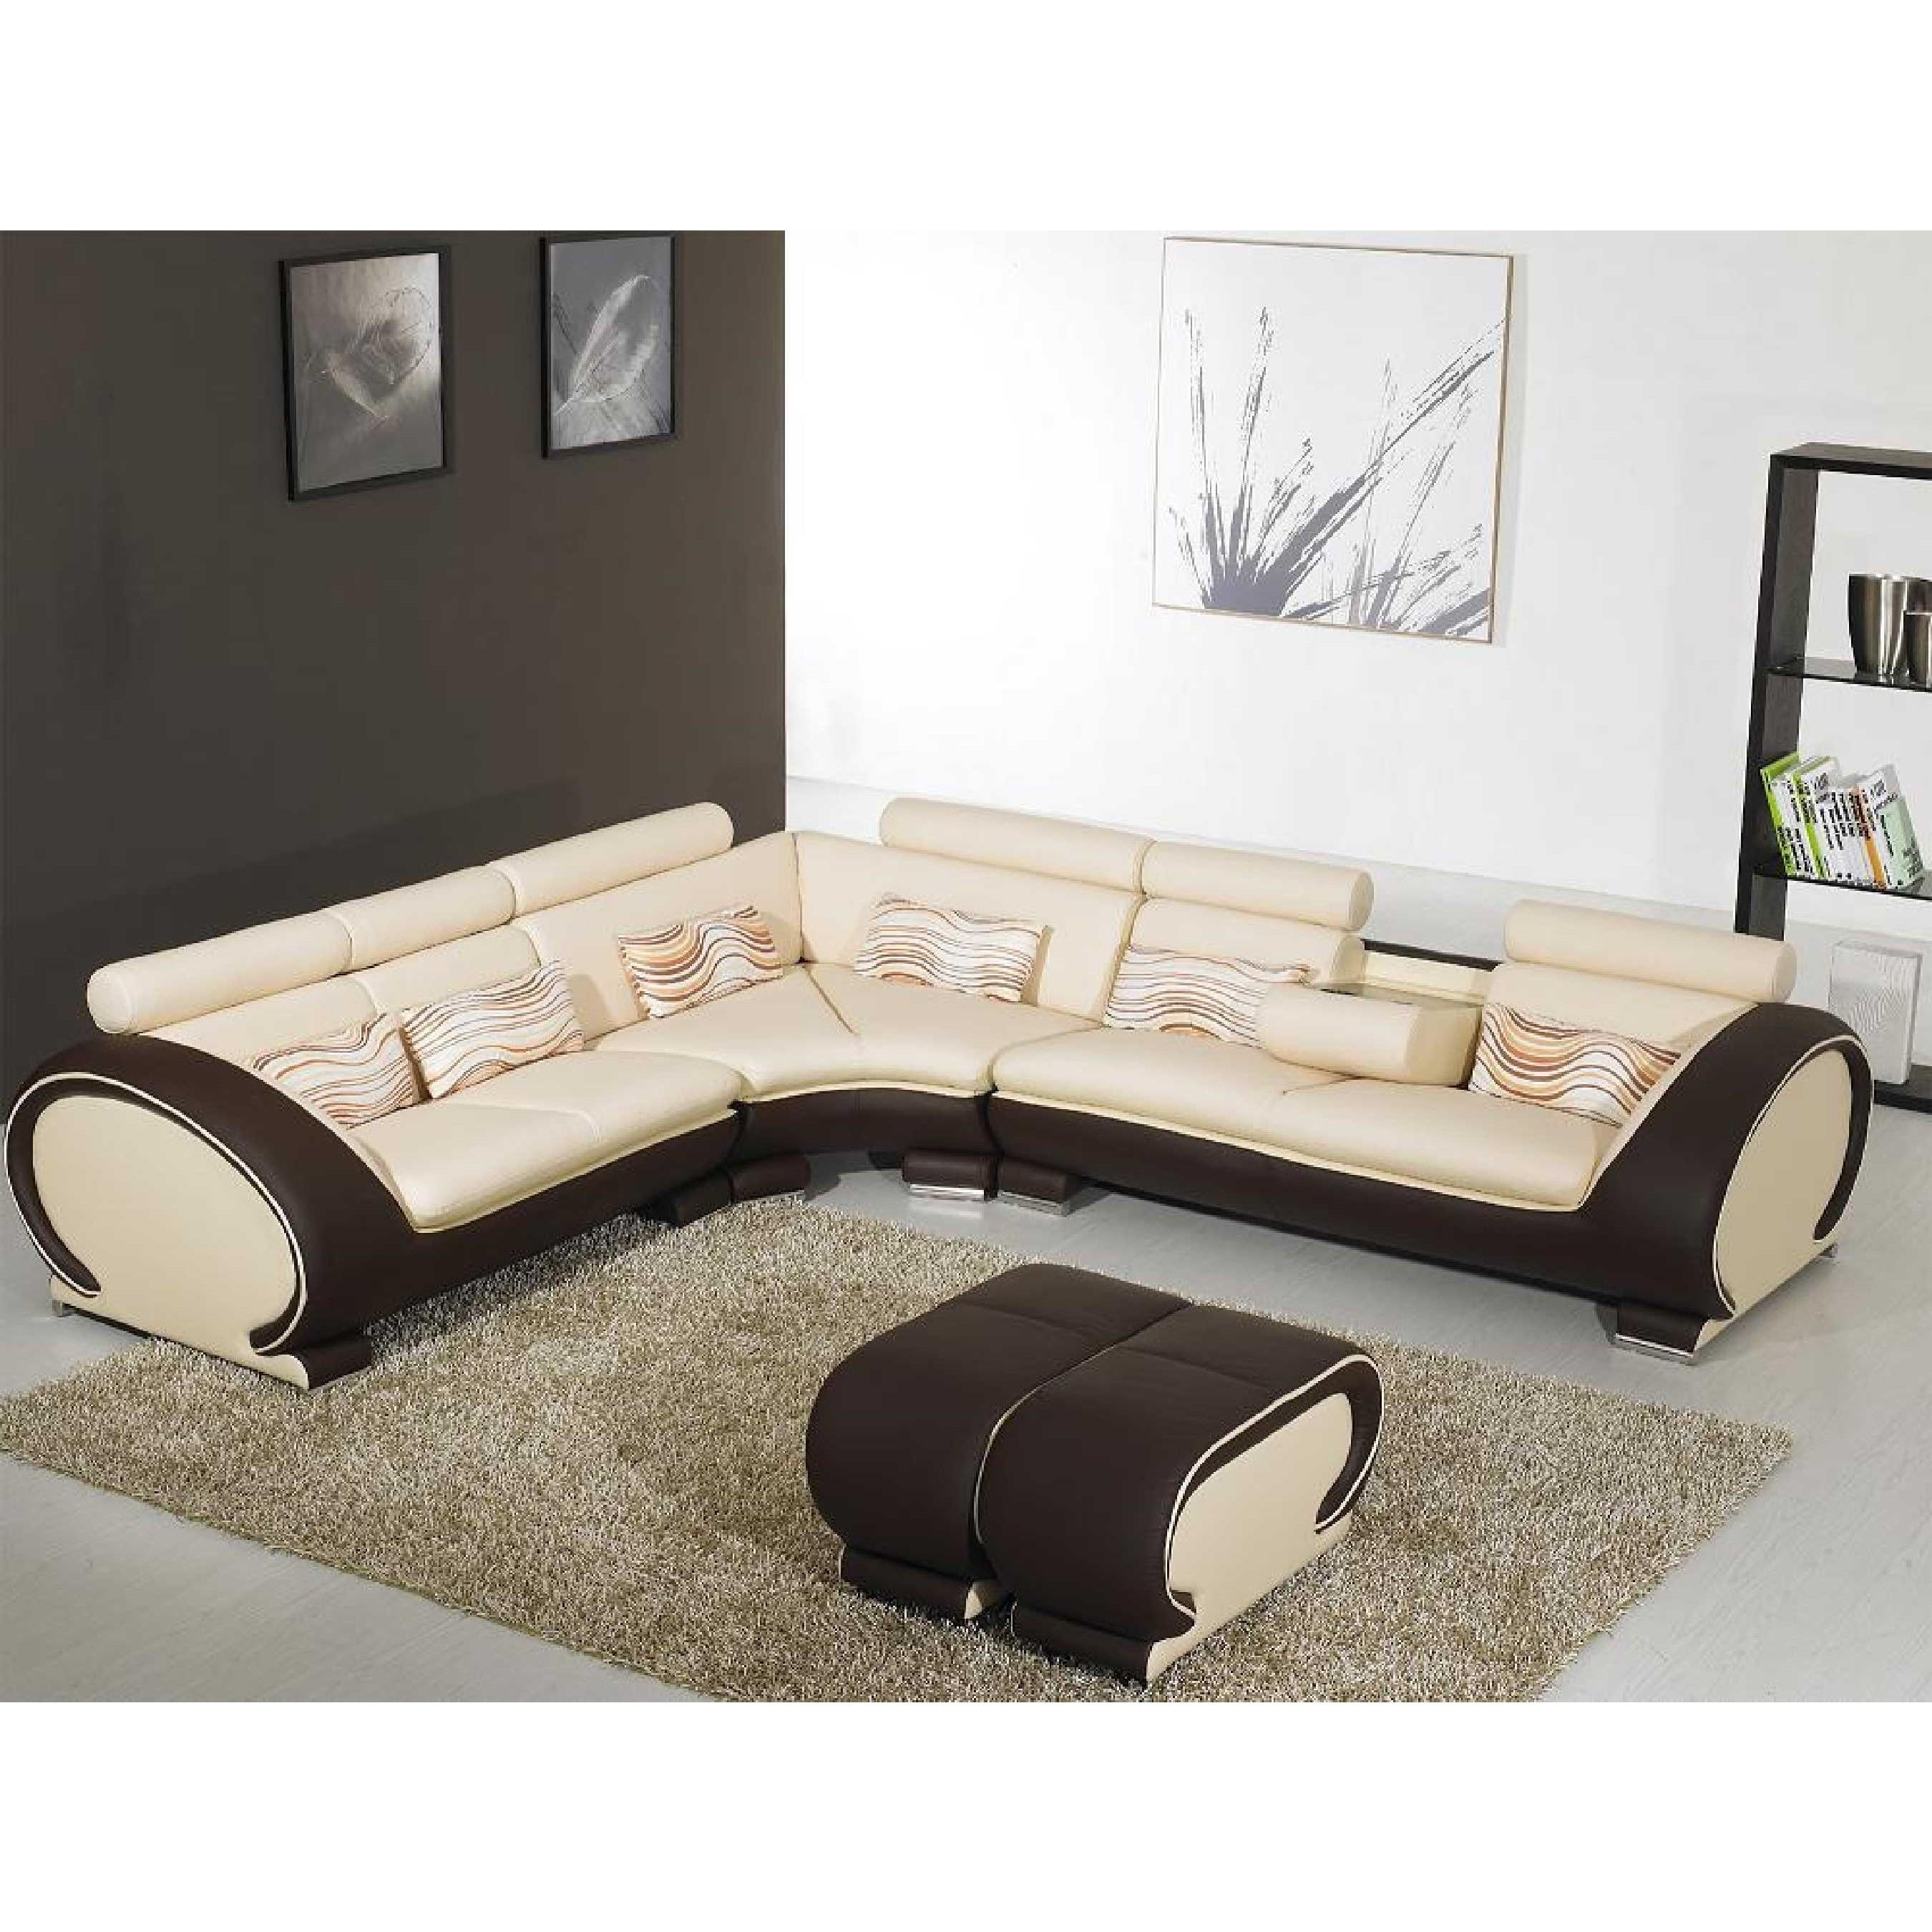 Sofas : Marvelous Leather Sofa Set Contemporary Sectionals L Regarding Unique Corner Sofas (Image 14 of 21)